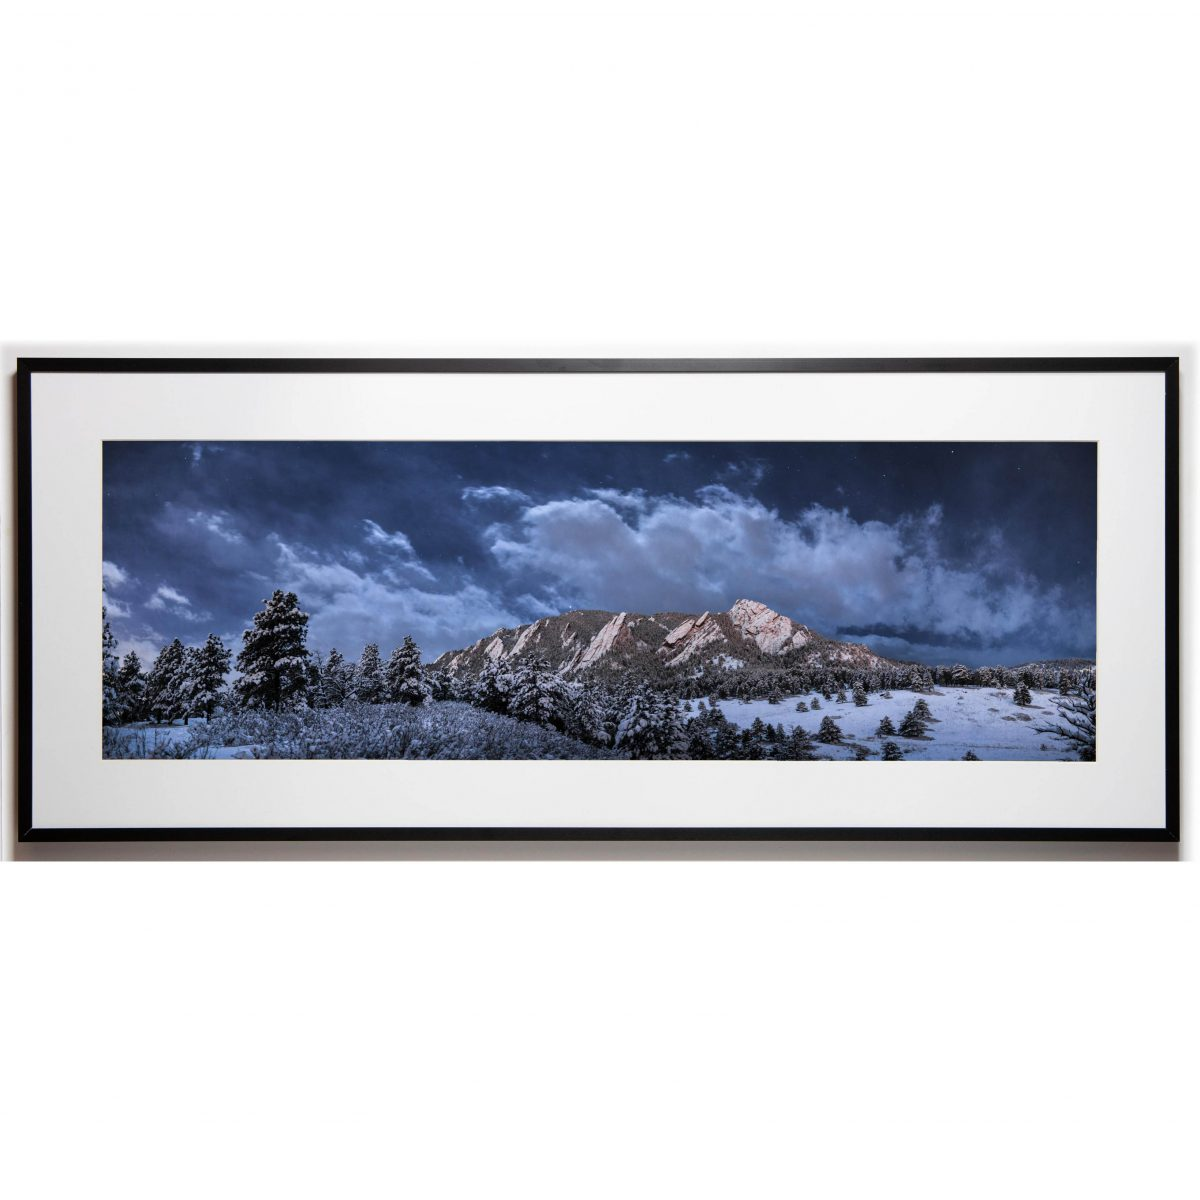 Cullis 10x30 framed - Flatirons Cloudy cropped